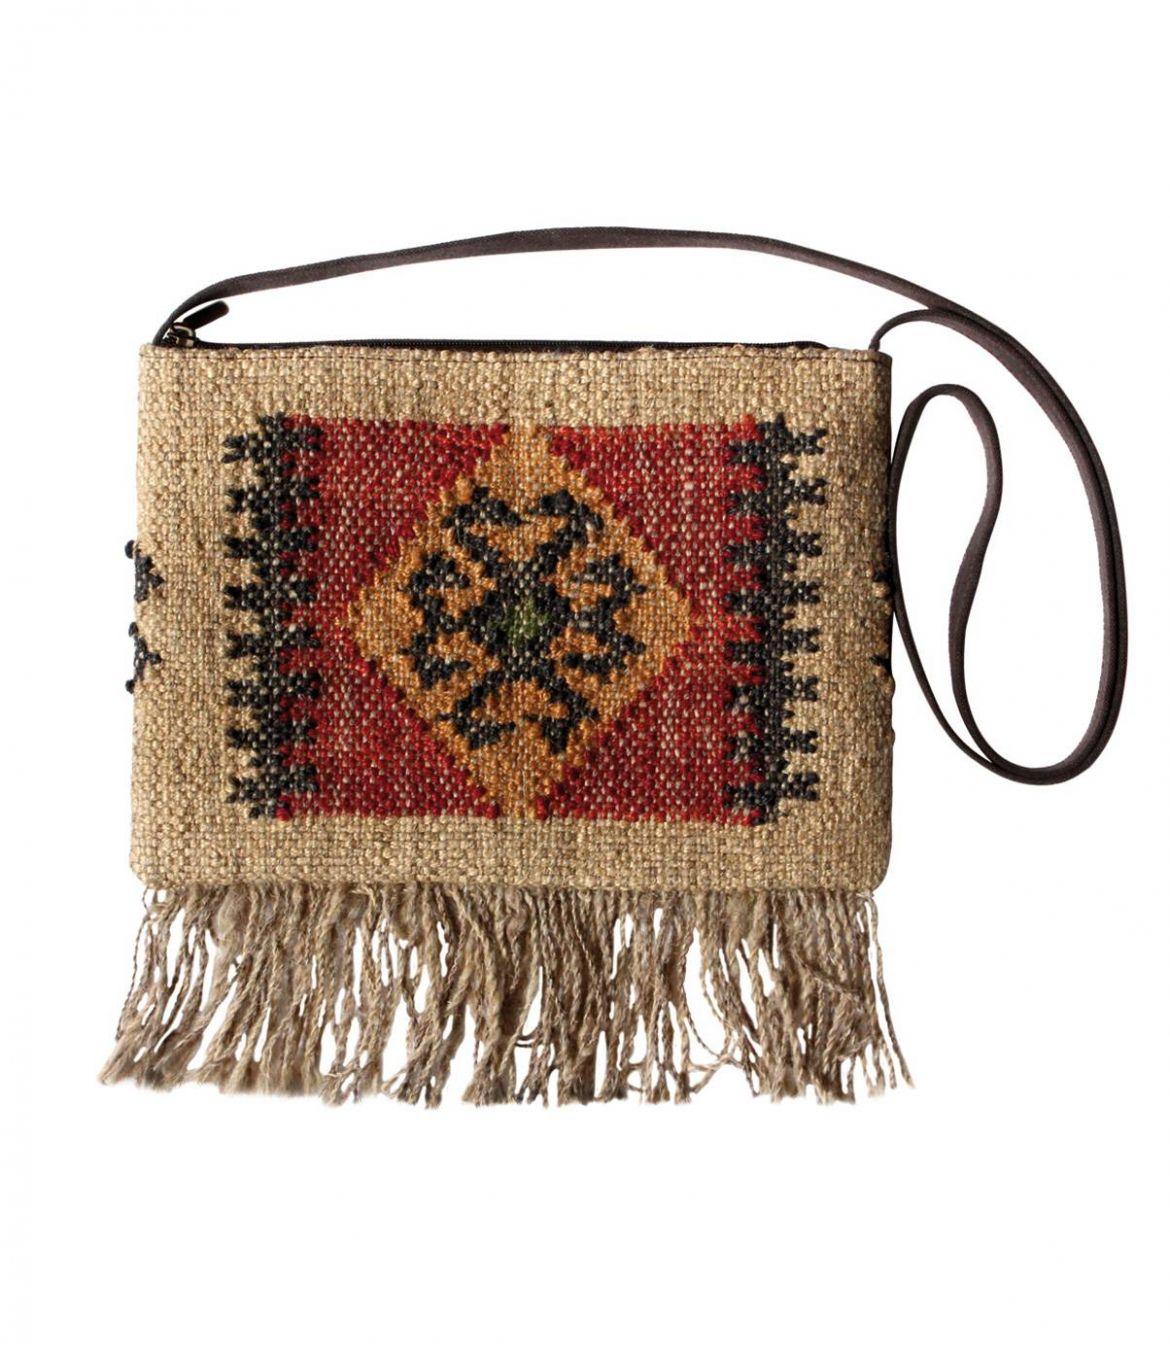 CADDO Cotton Bag, Jute for Women 22x28 cm Storiatipic - 1